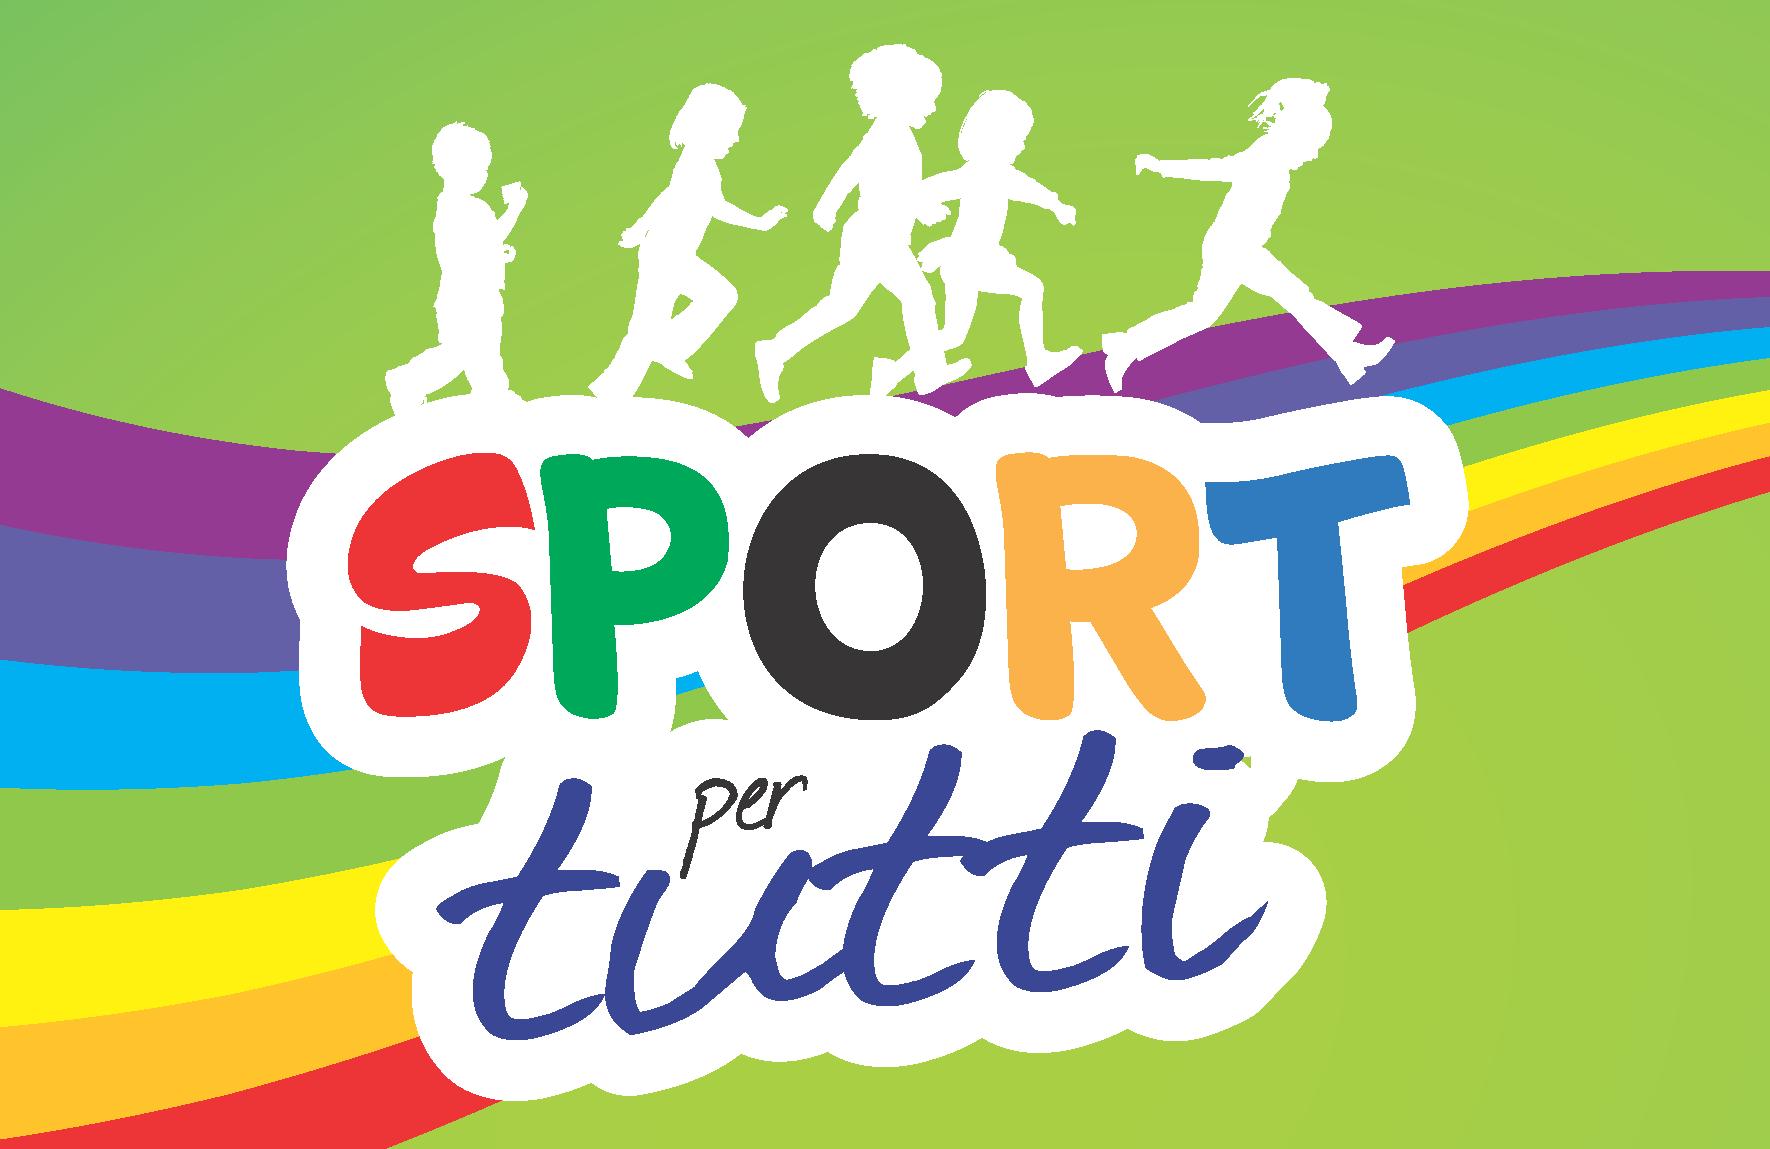 SPORT-PER-TUTTI-Vol-A5-Fronte-ok